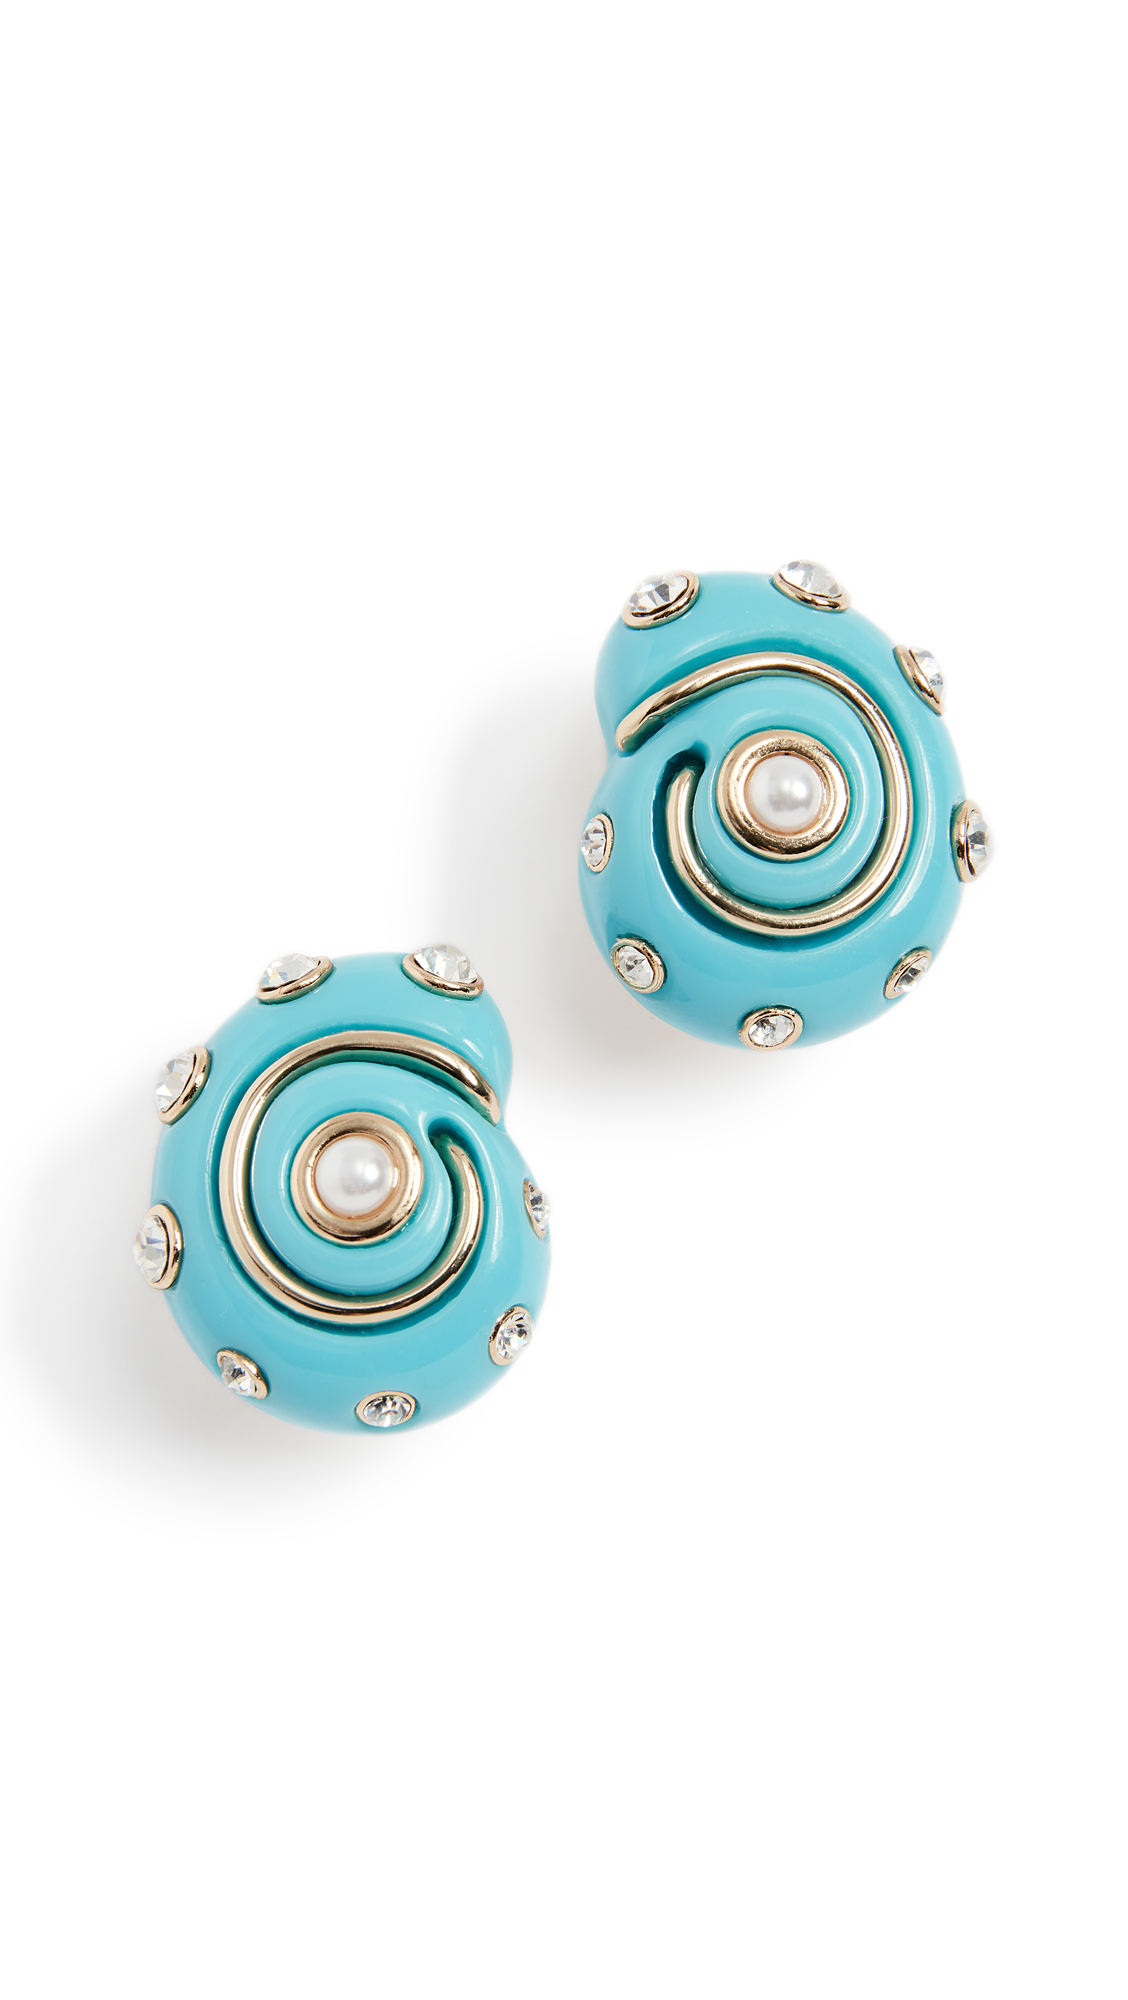 Kenneth Jay Lane Shell Earrings In Turquoise